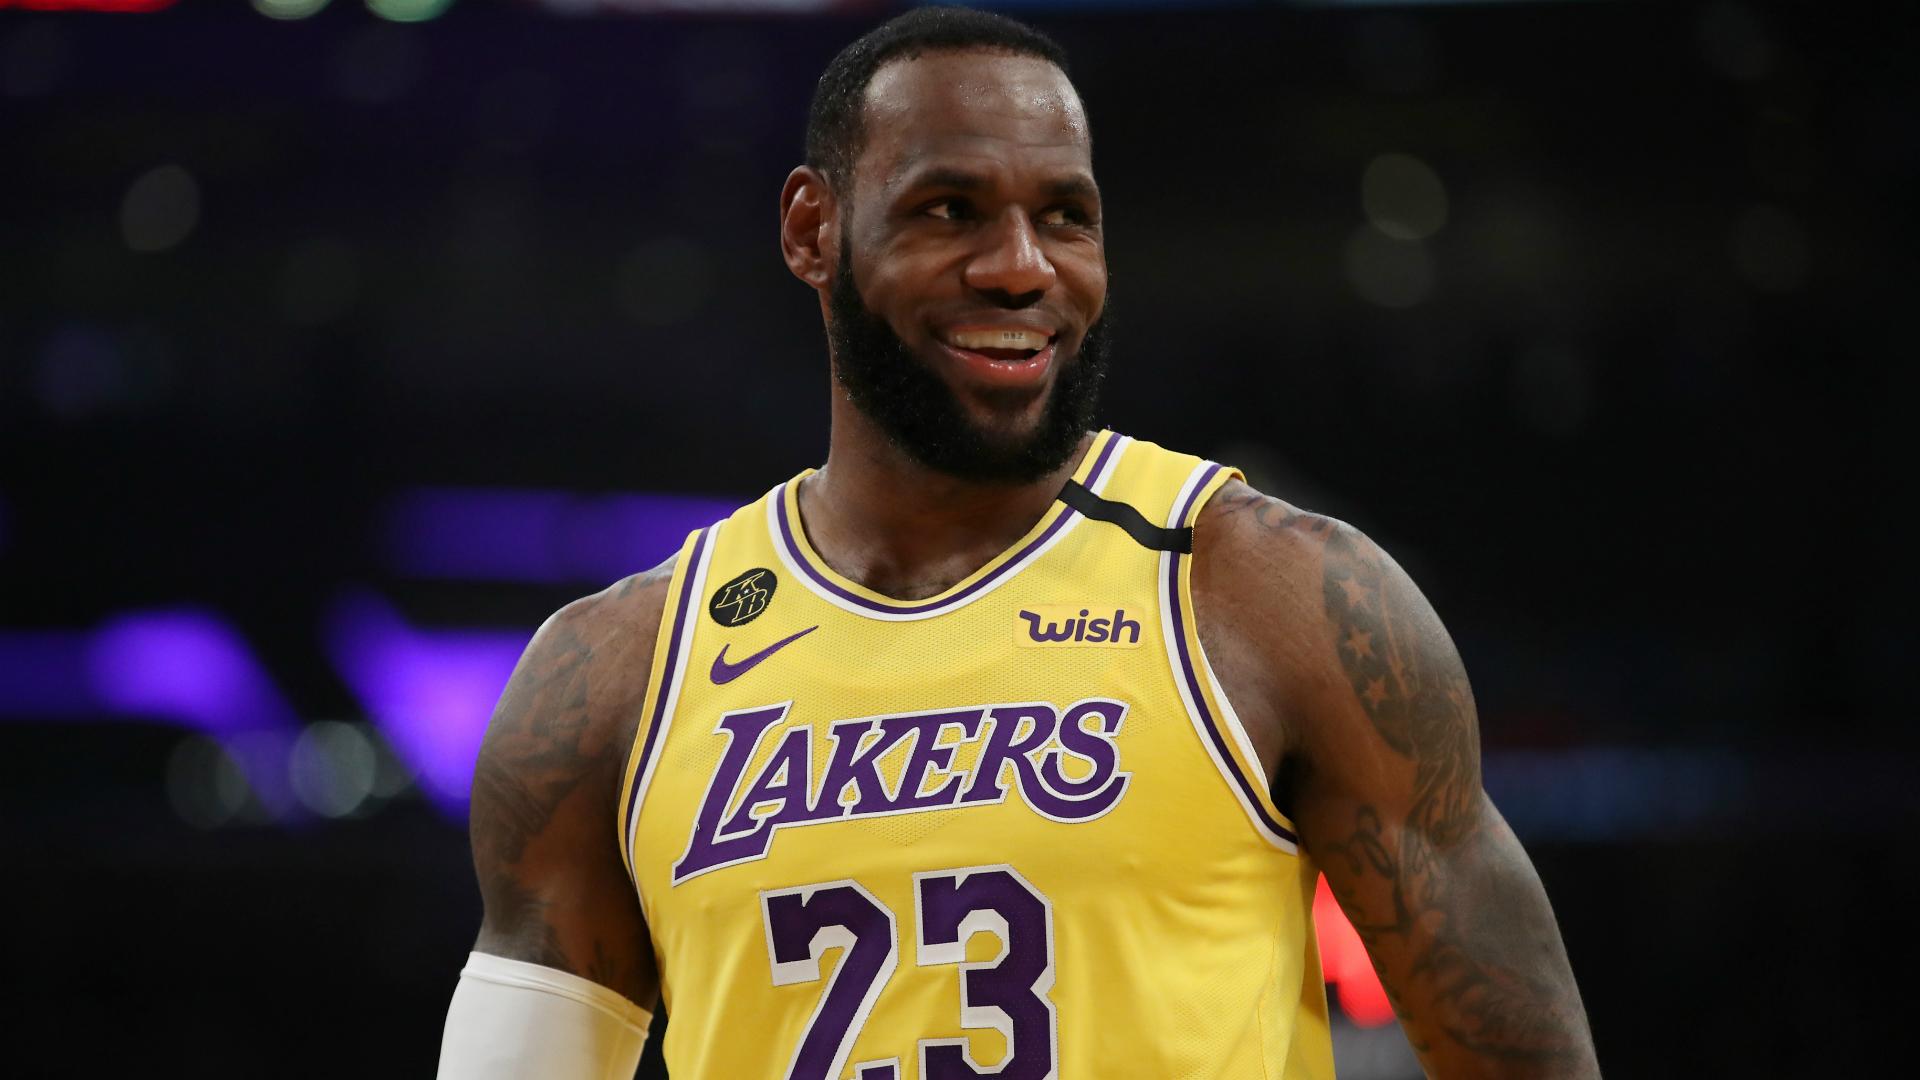 LeBron James on MVP race: 'I've shown what I'm capable of doing'